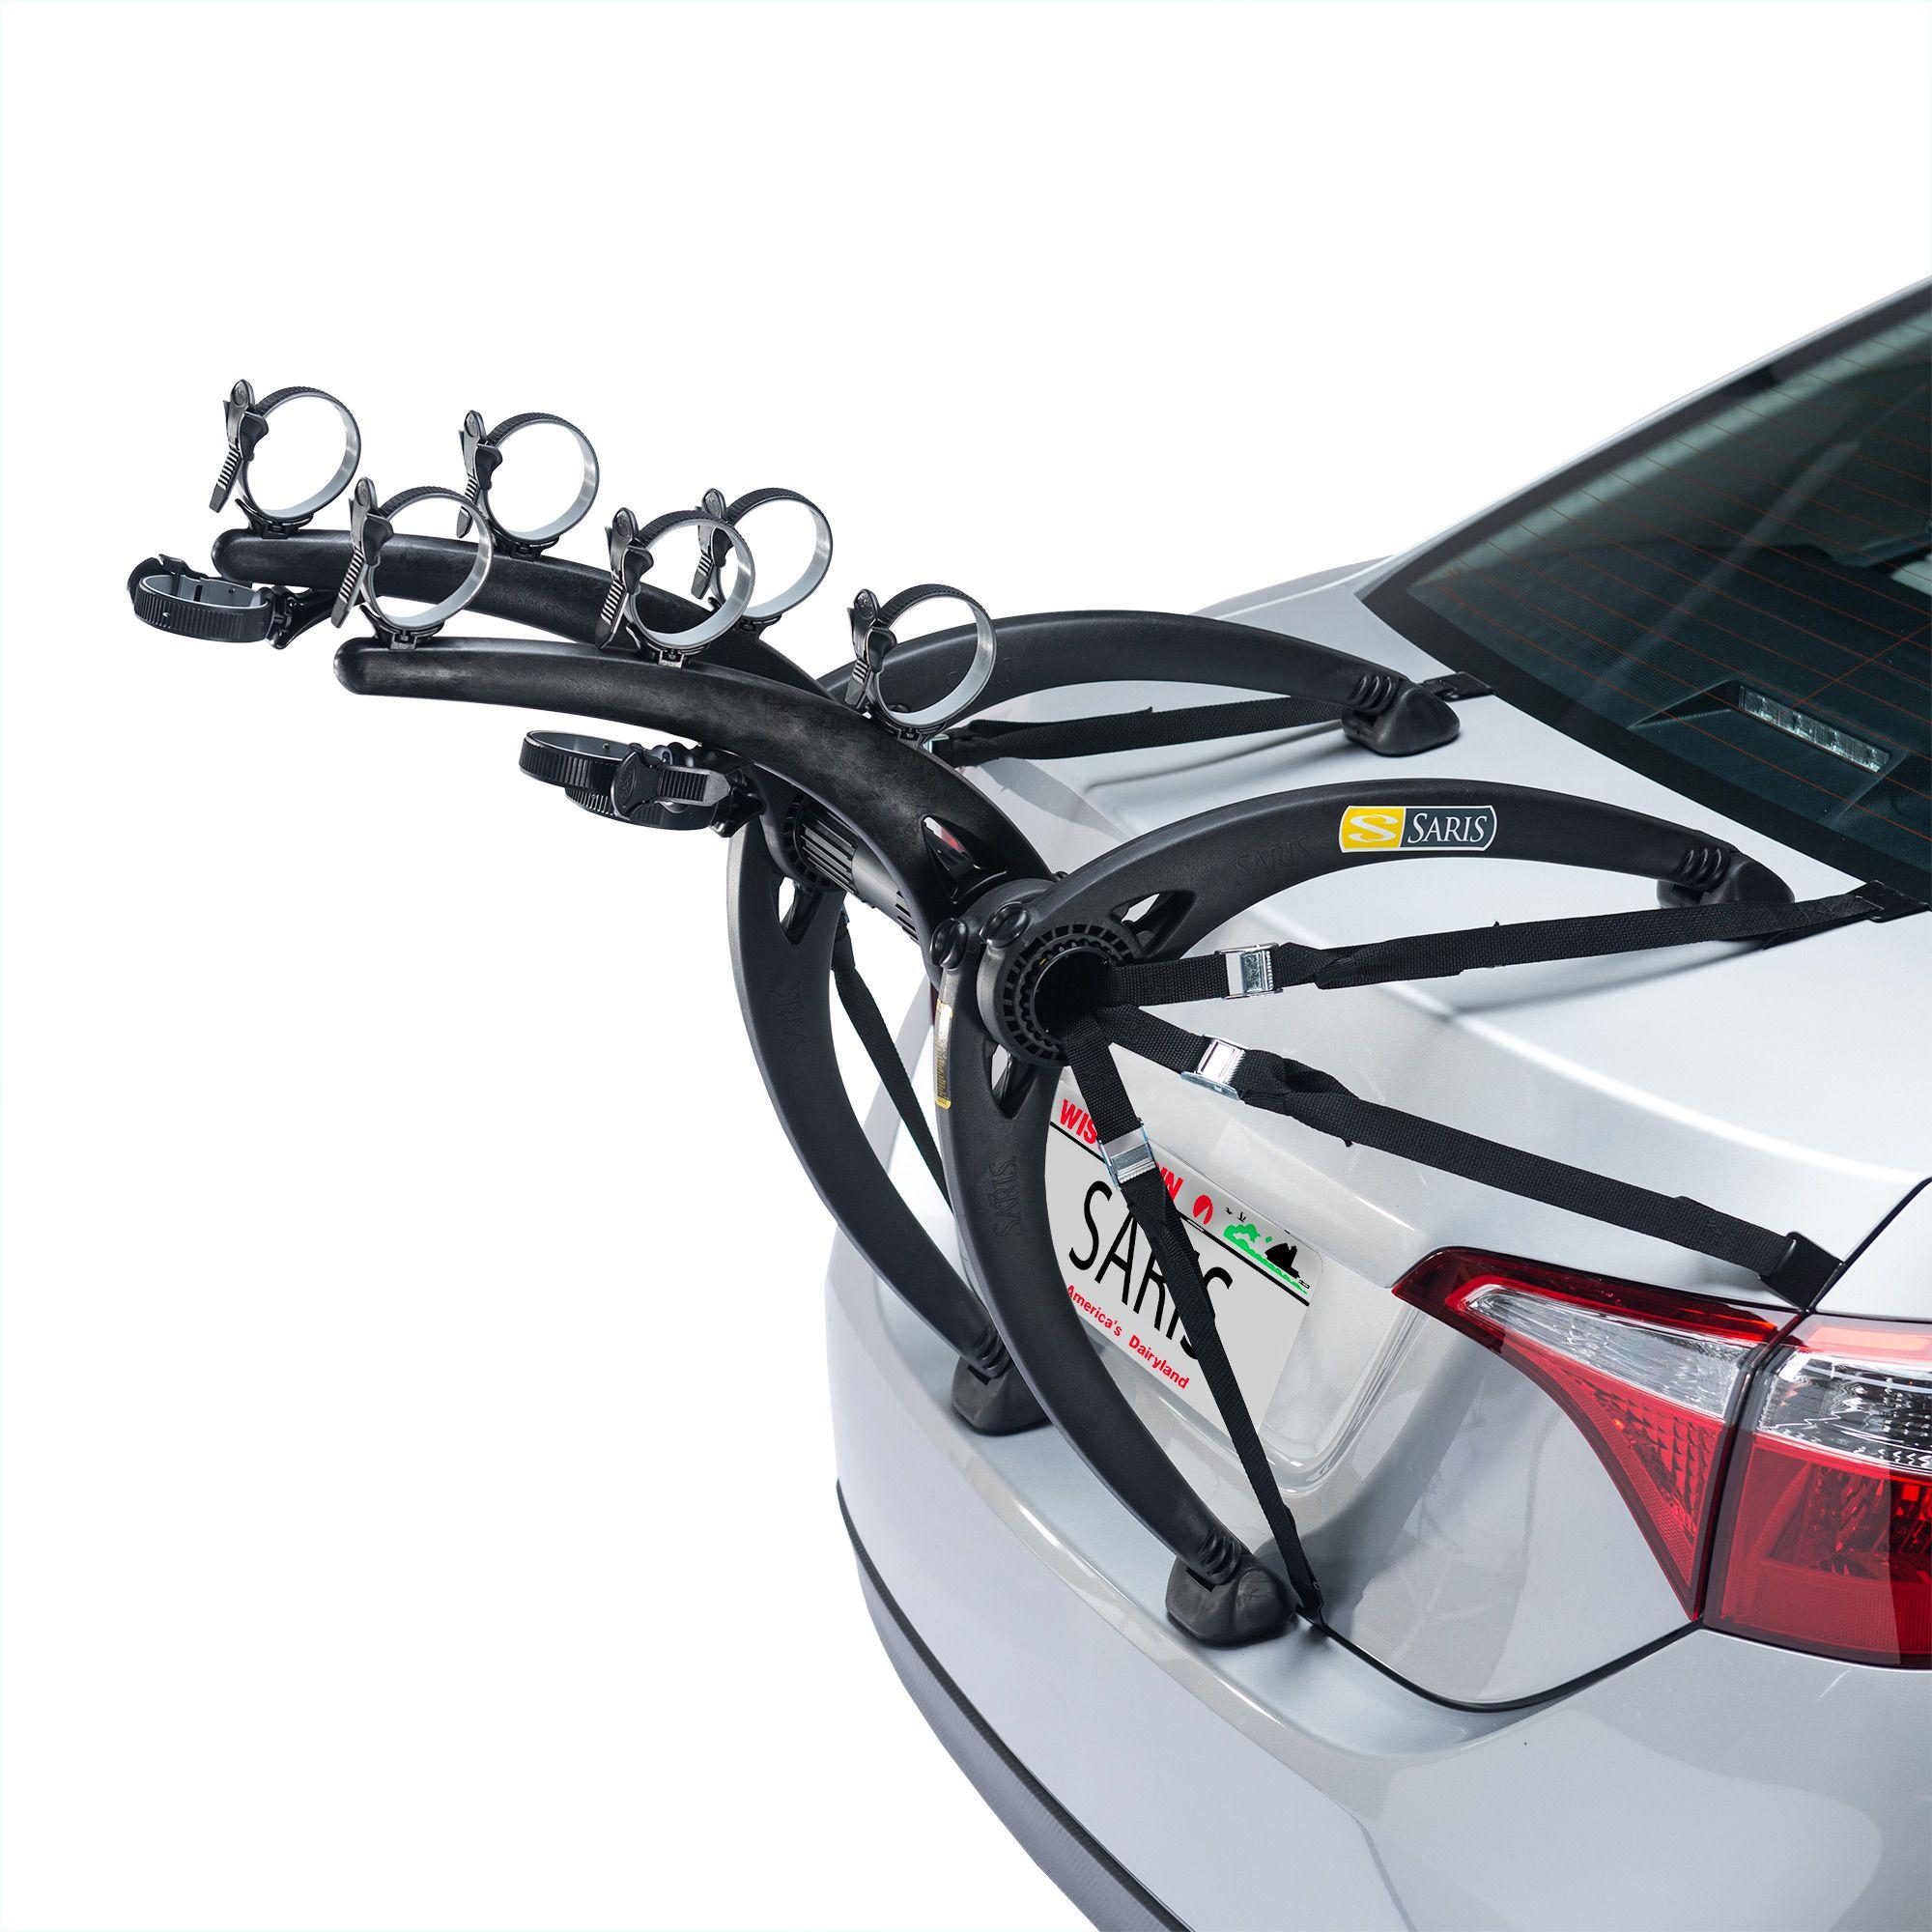 This Saris Bones 3 Bike Trunk #Bike #Rack Has A Unique